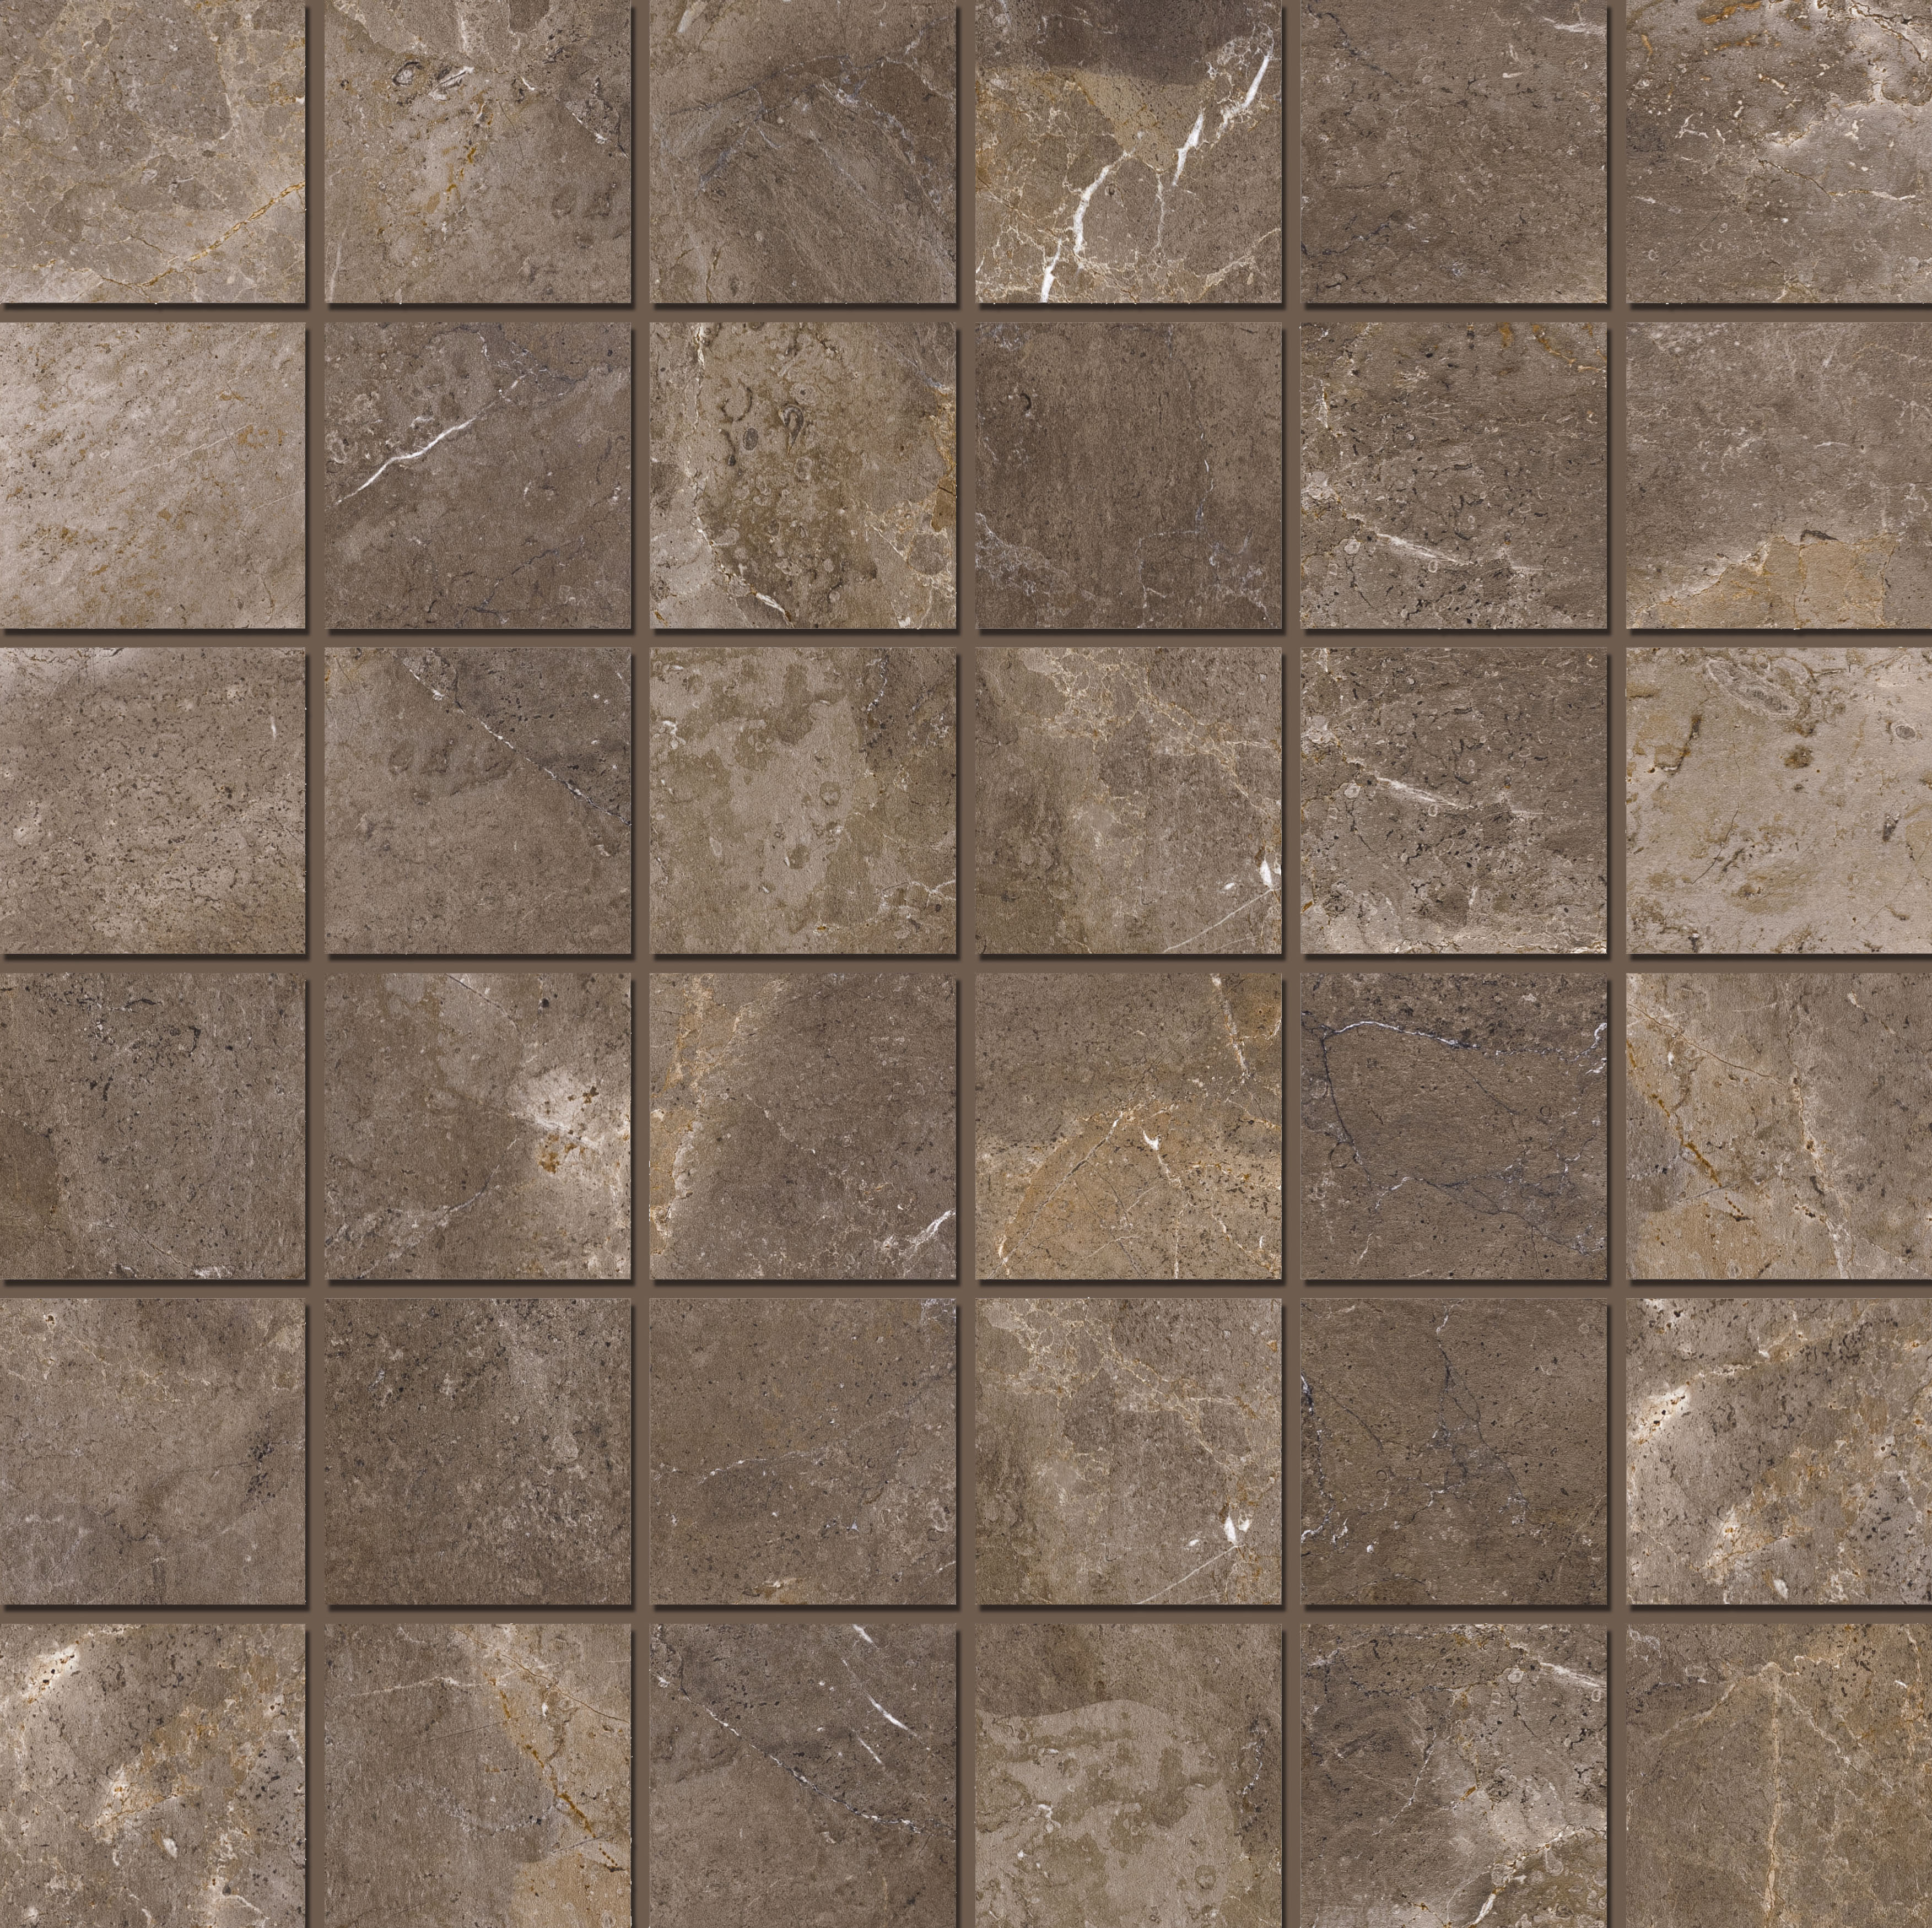 Mosaic 4,7x4,7 Imperial Brown